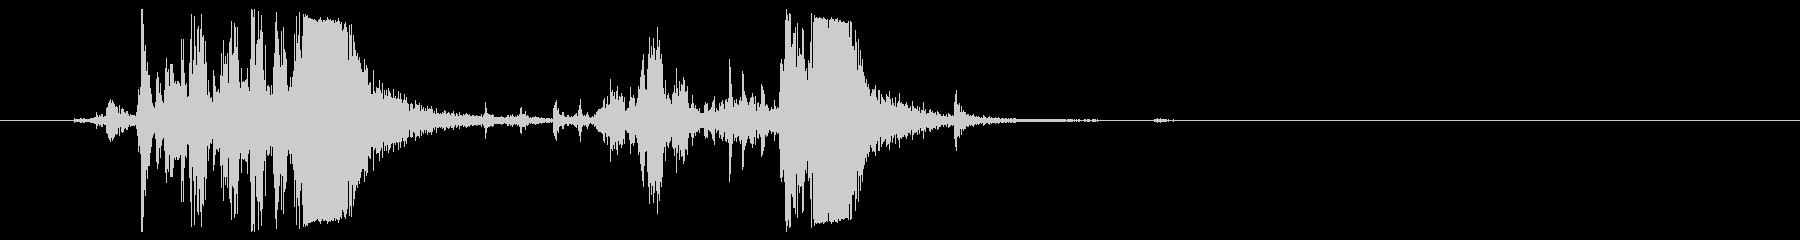 MOSSBERG M500ポンプア...の未再生の波形